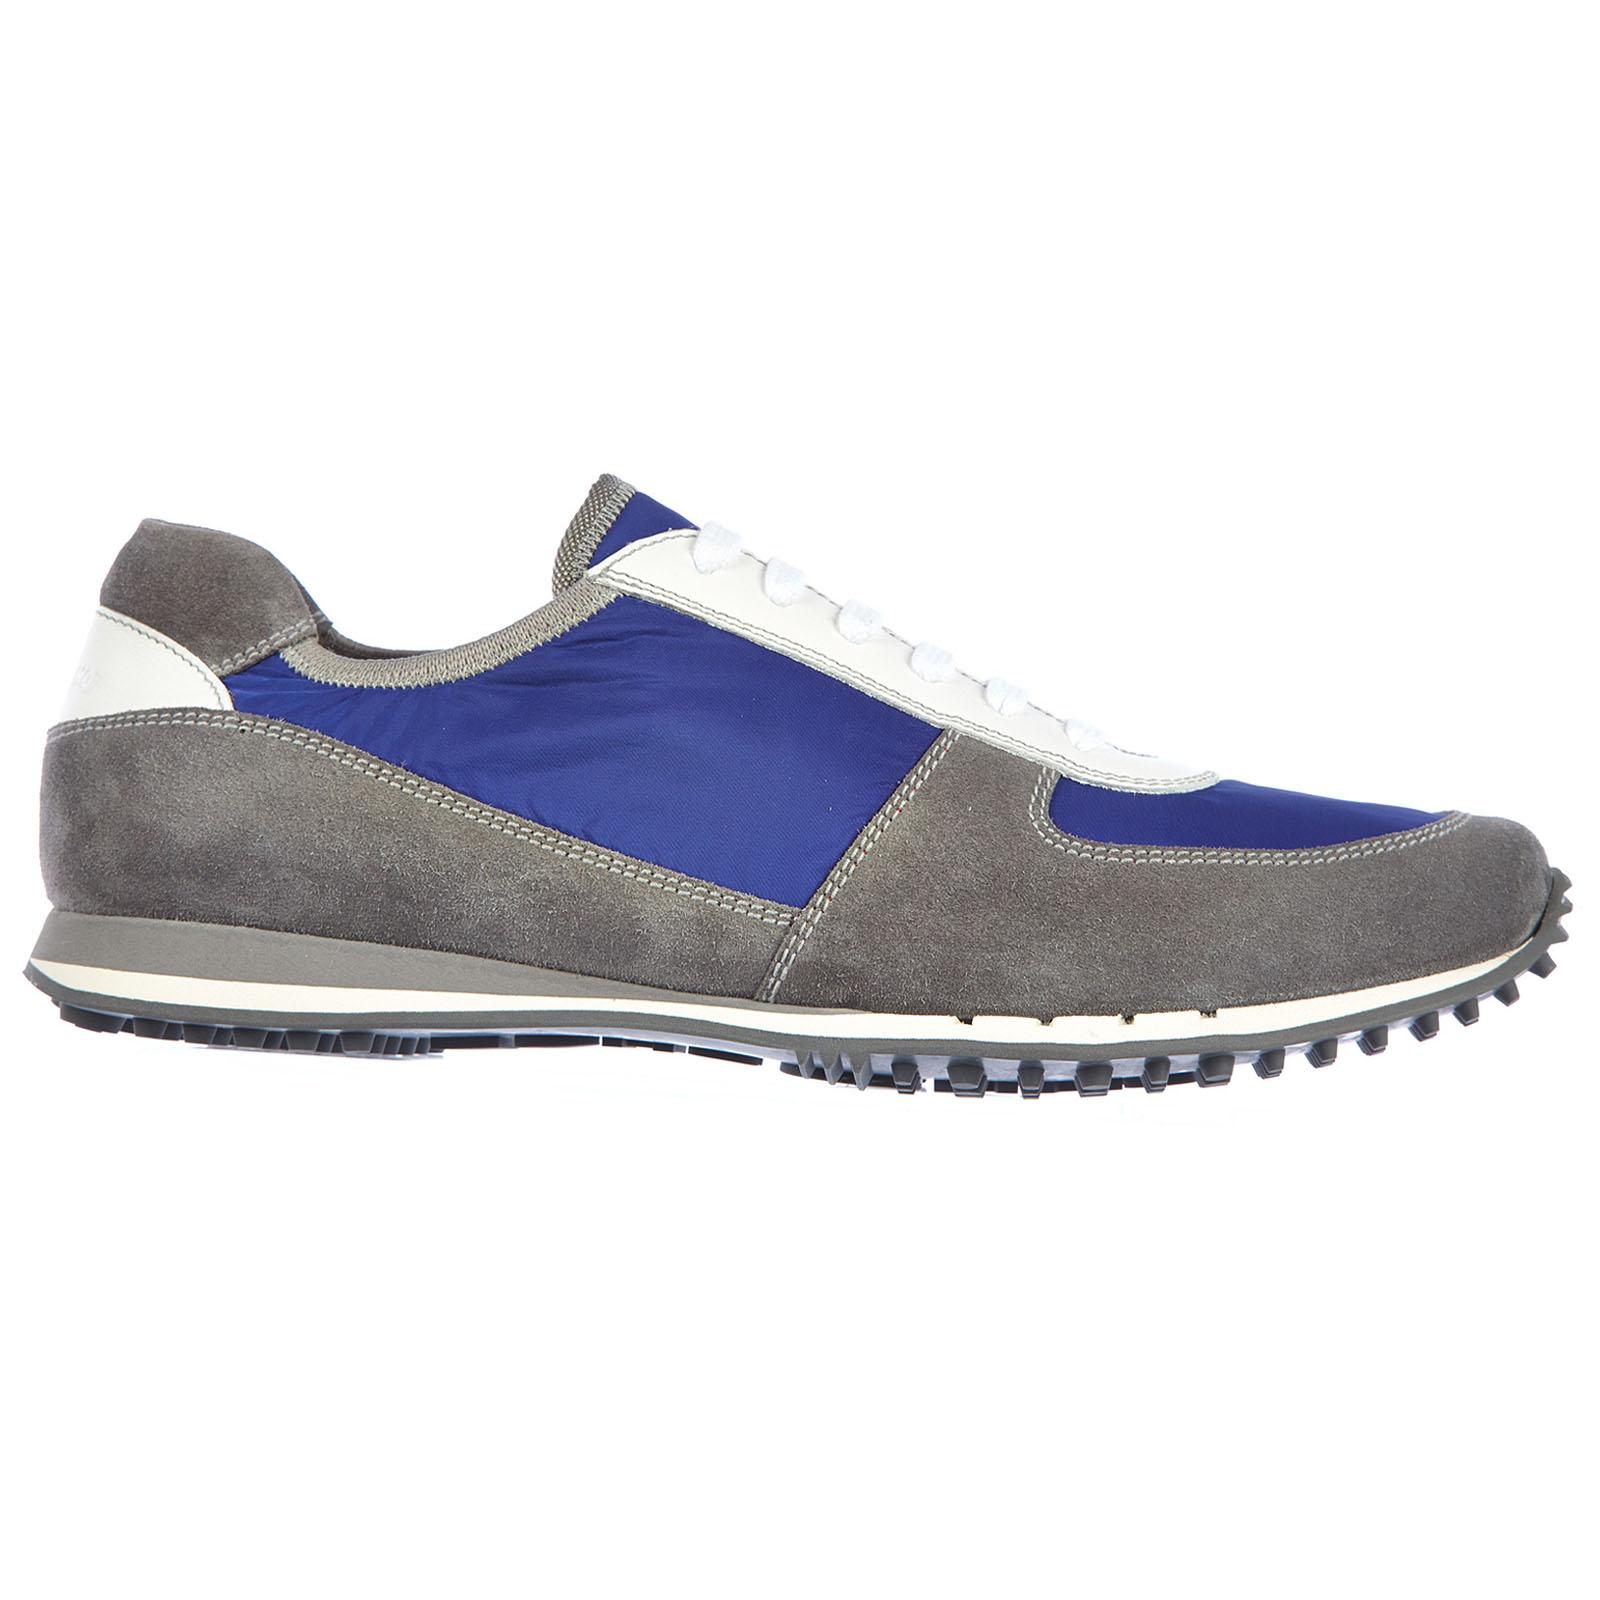 Scarpe sneakers uomo camoscio indago